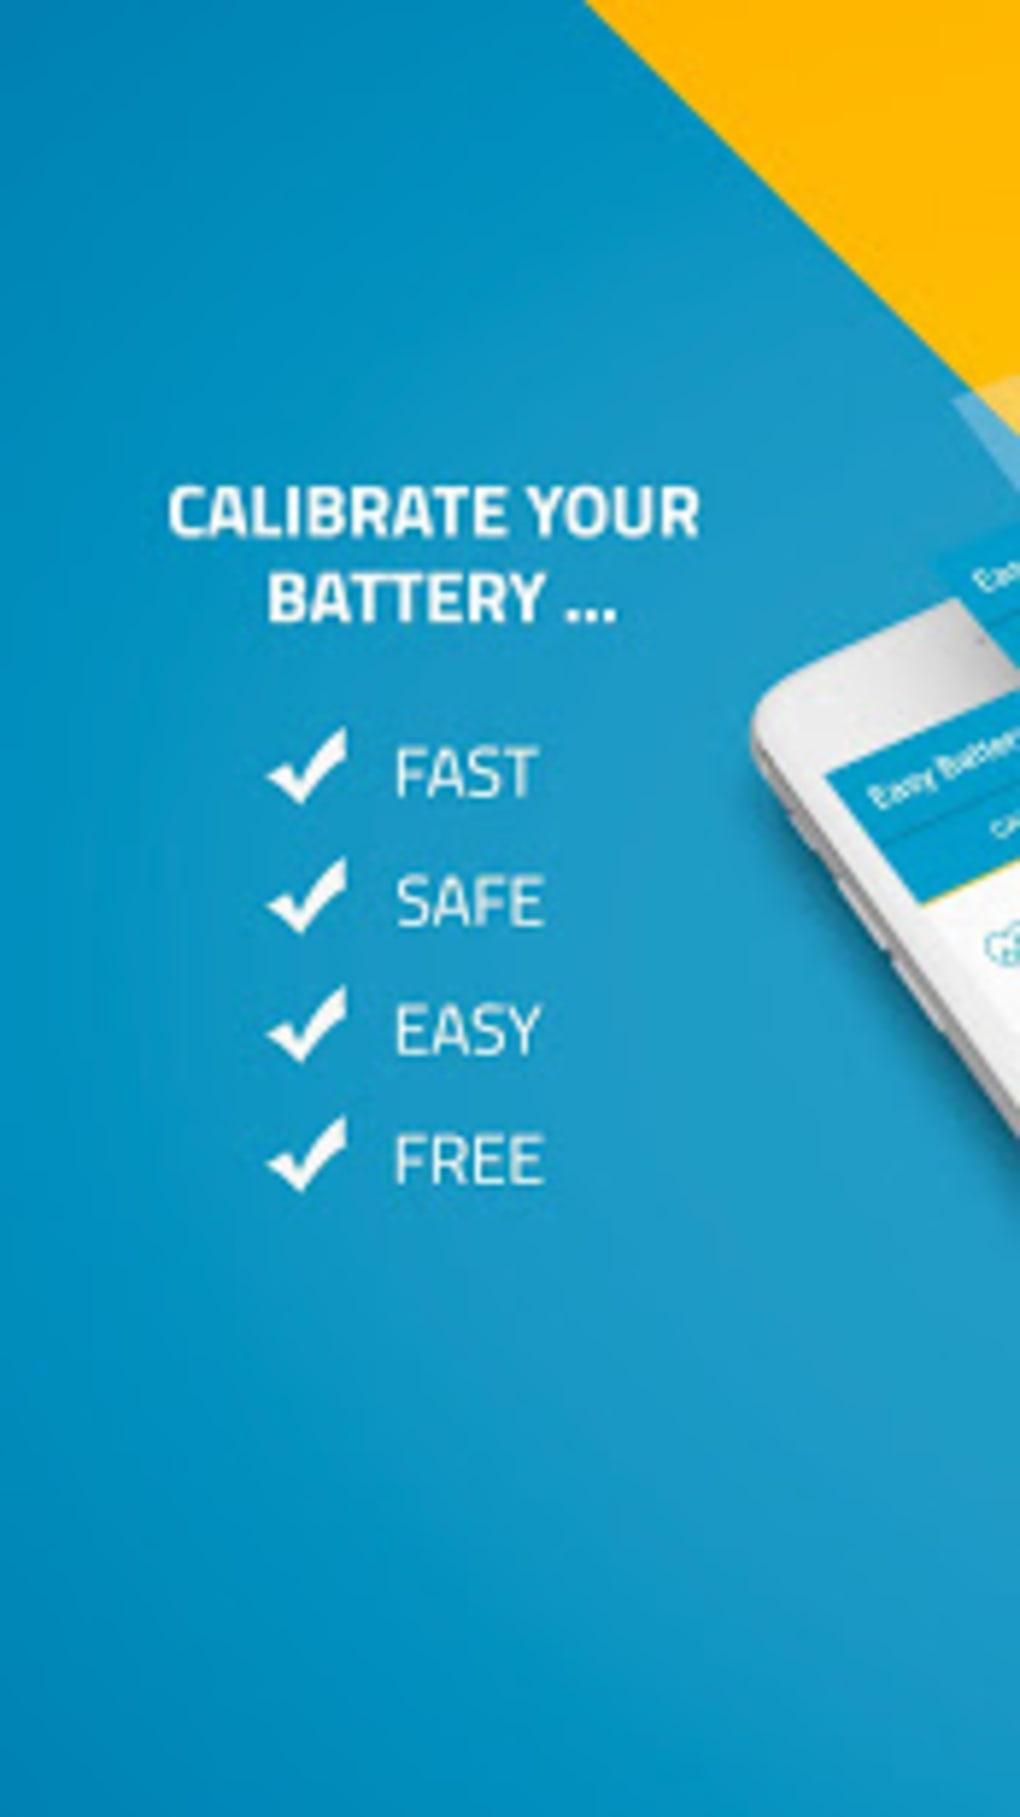 battery calibration apk